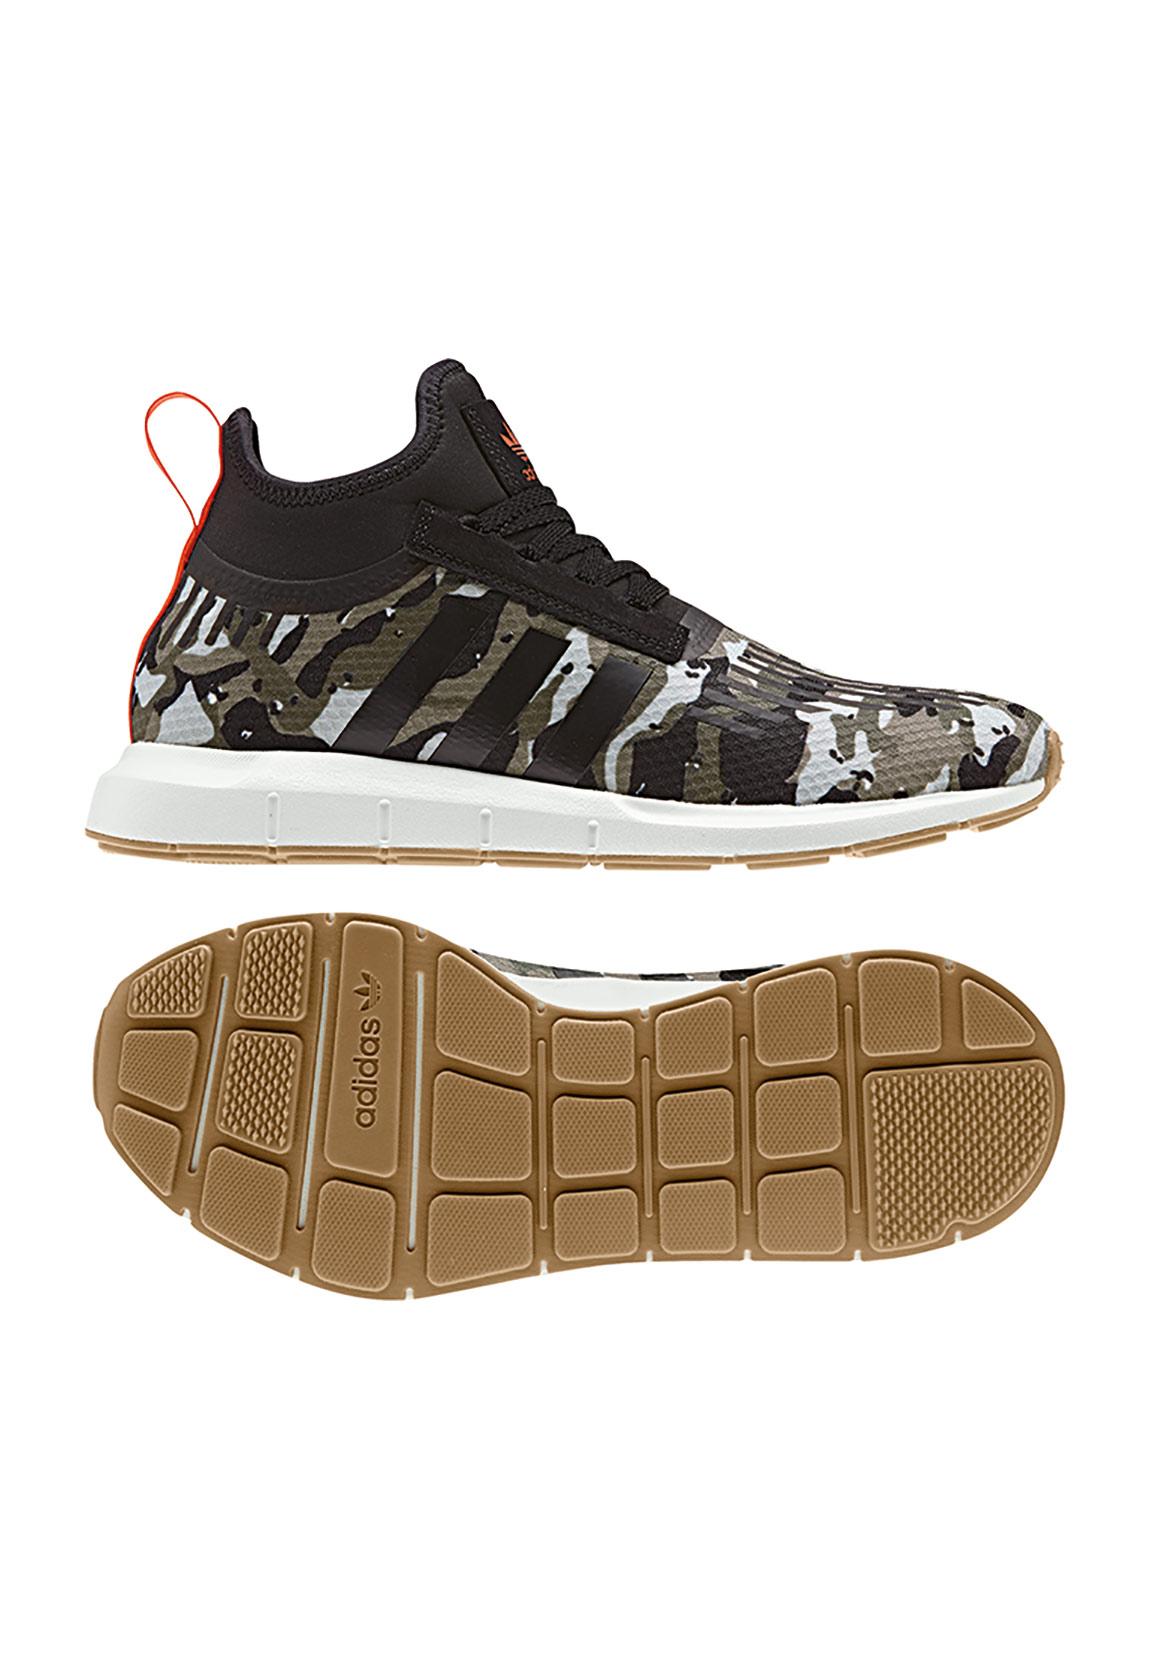 d853479422747 Adidas Originals Trainers Swift Run Barrier B42234 Camouflage